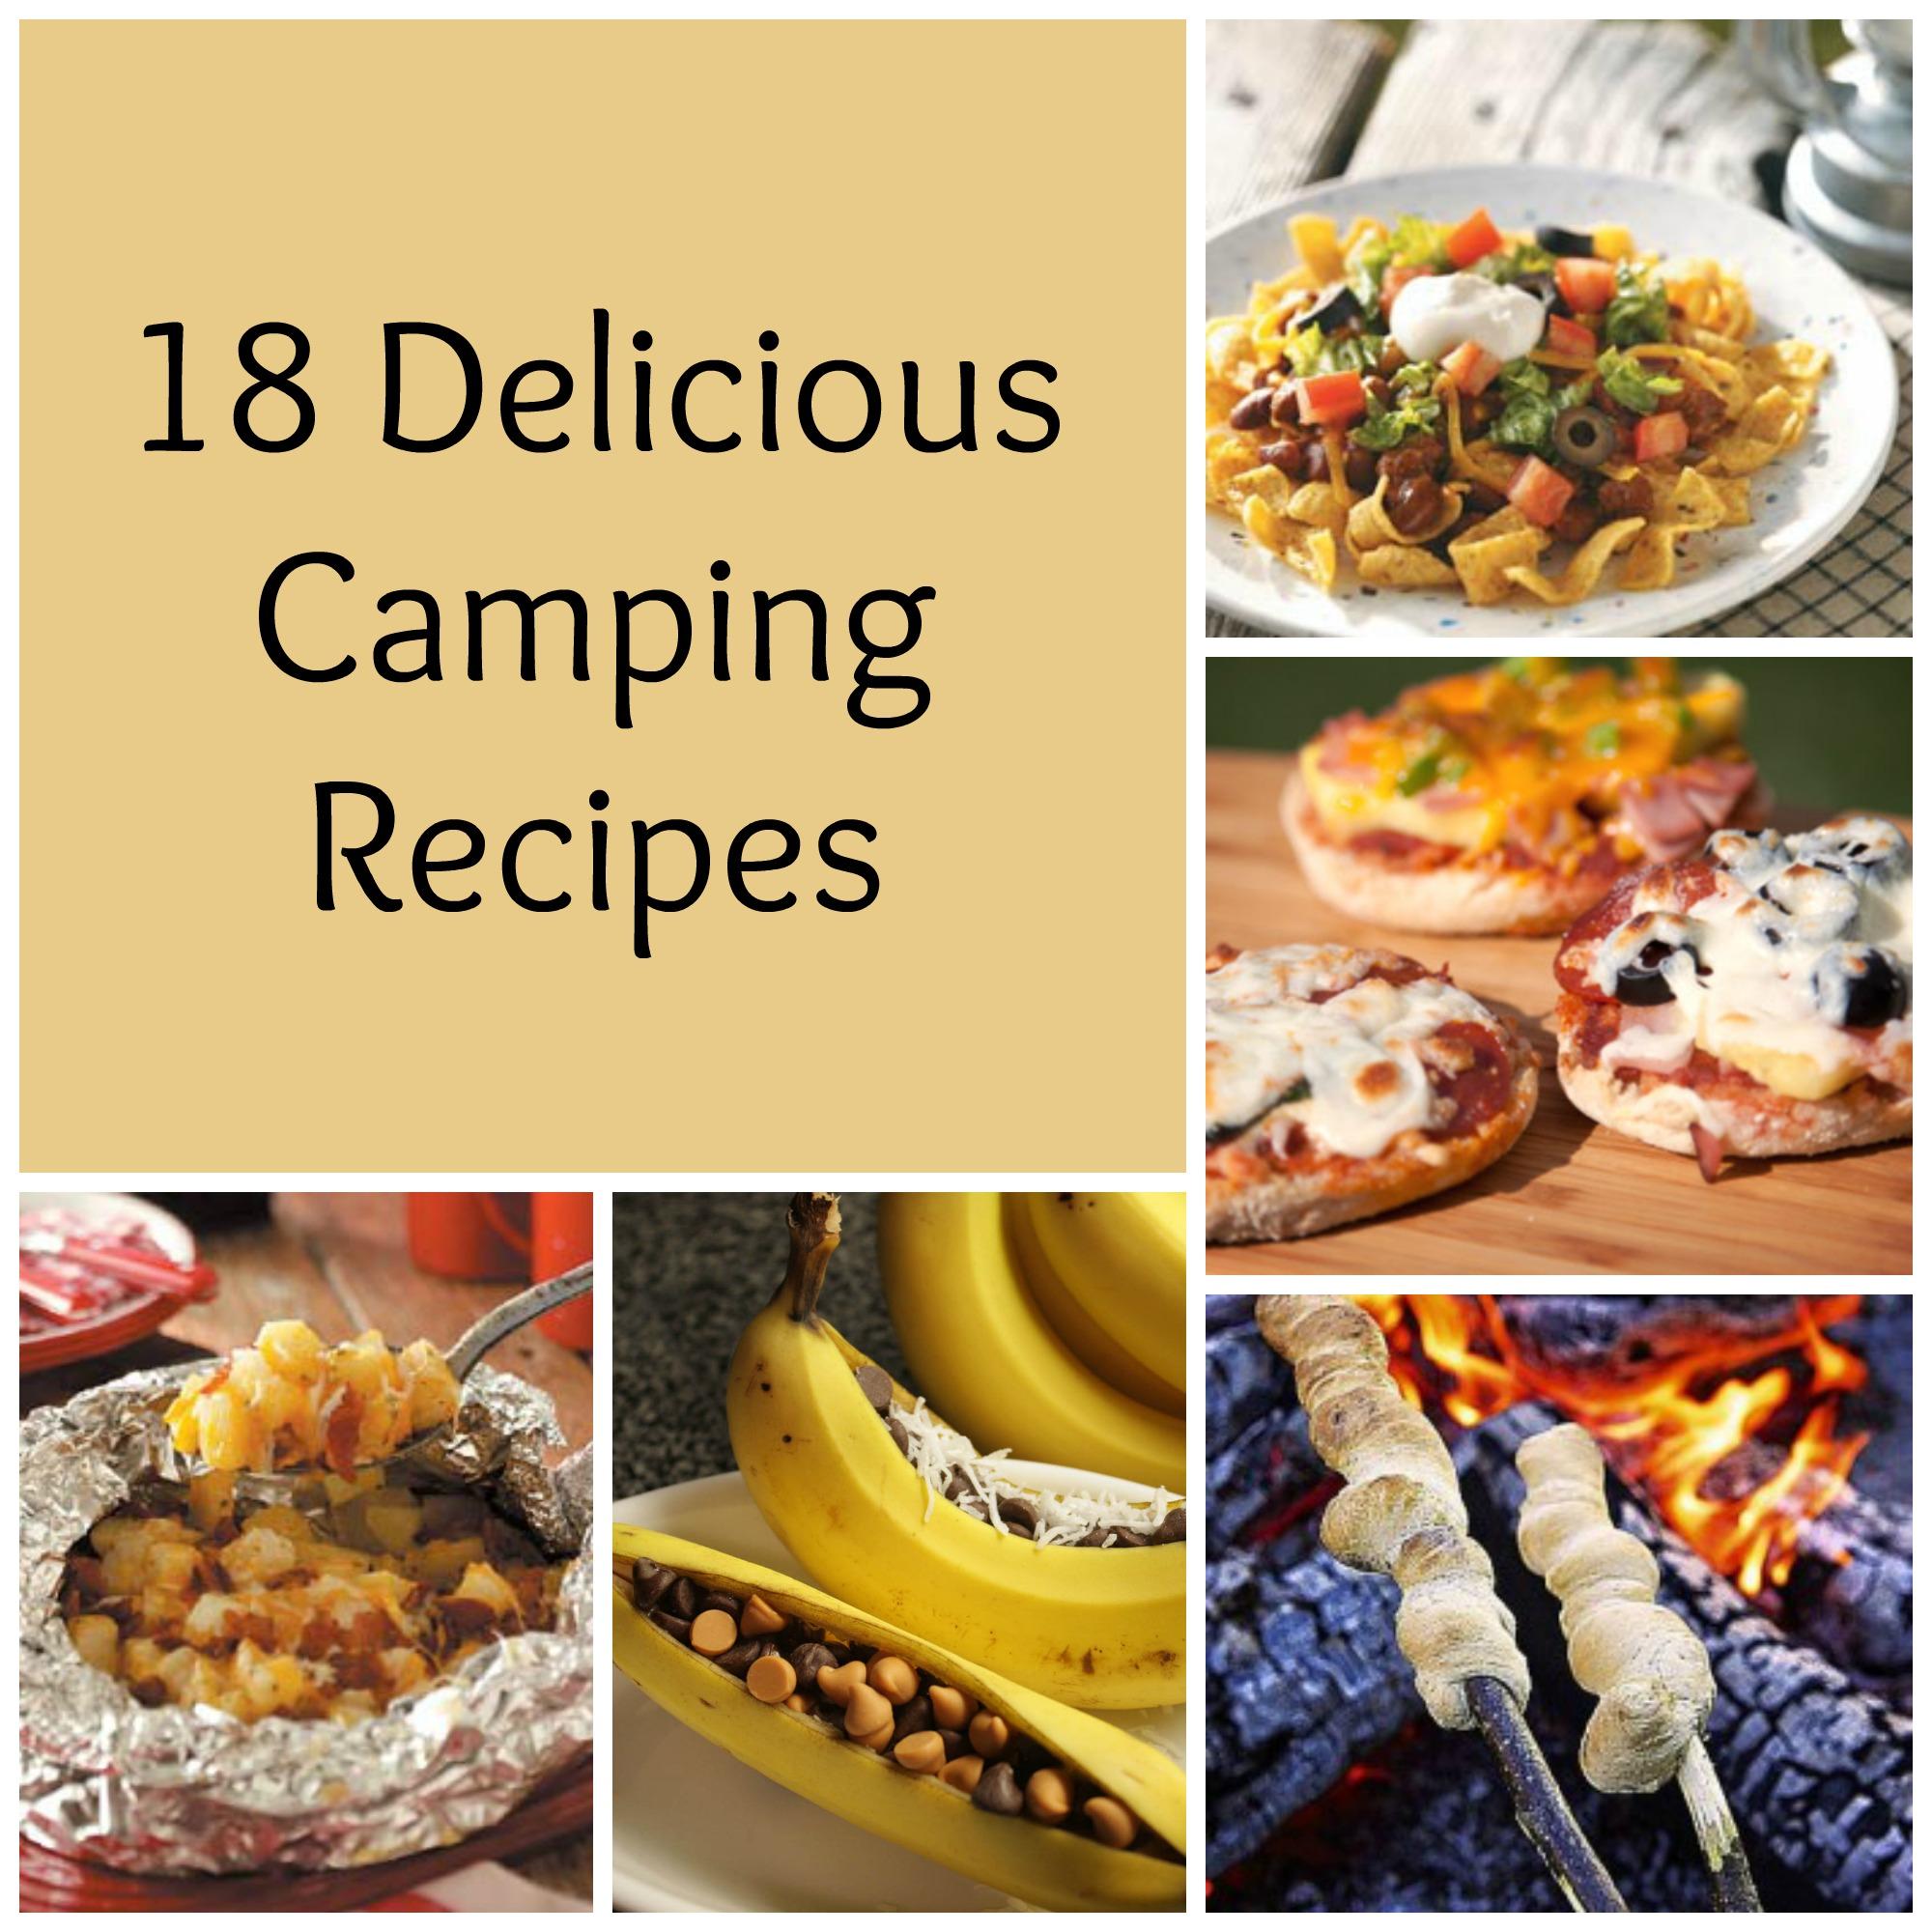 18 Delicious Camping Recipes